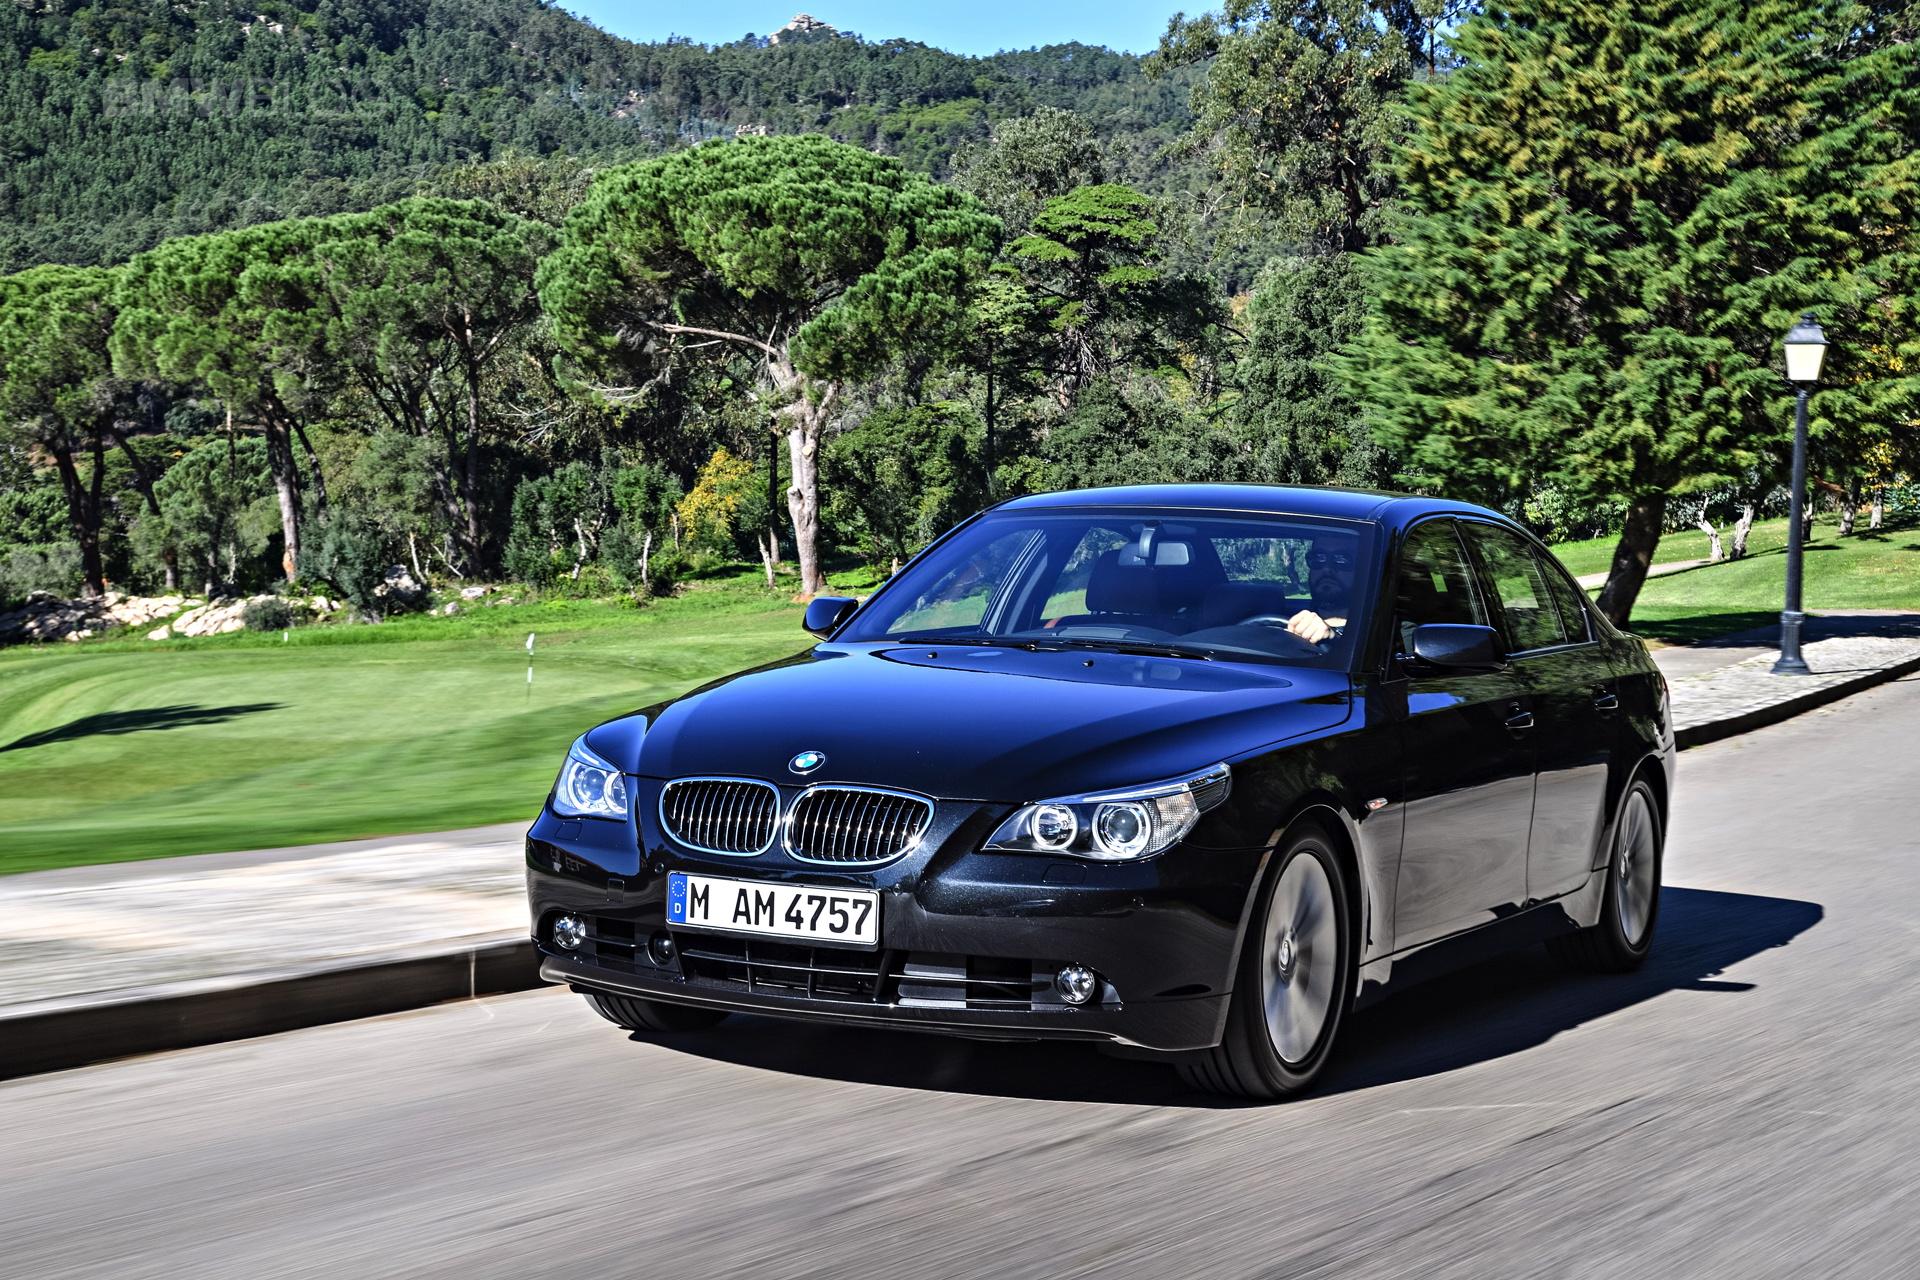 BMW E60 5 Series images 18